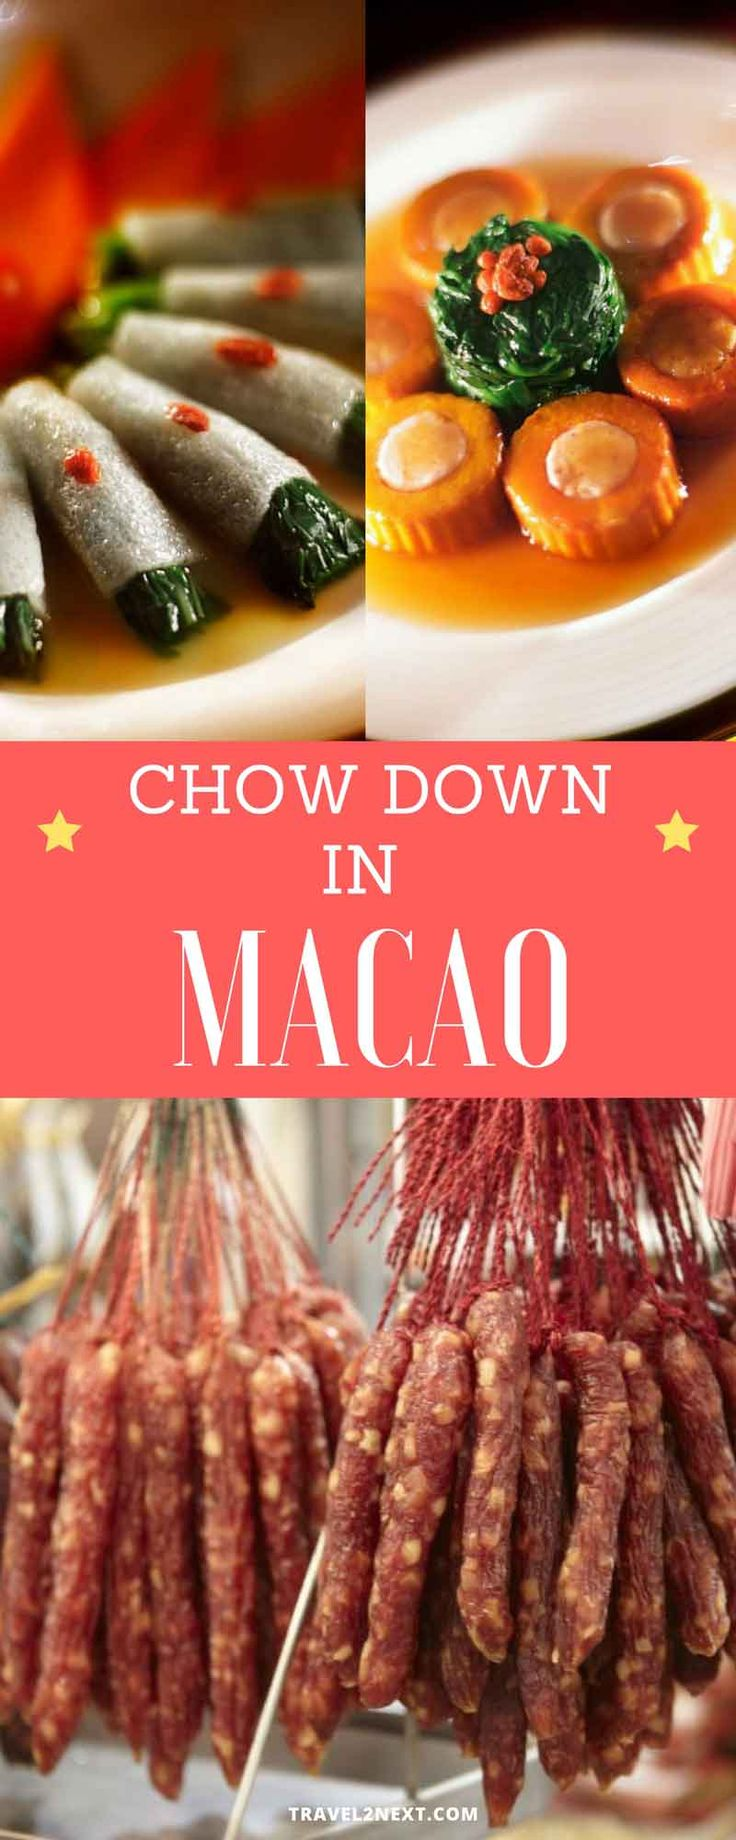 Chow down in Macau